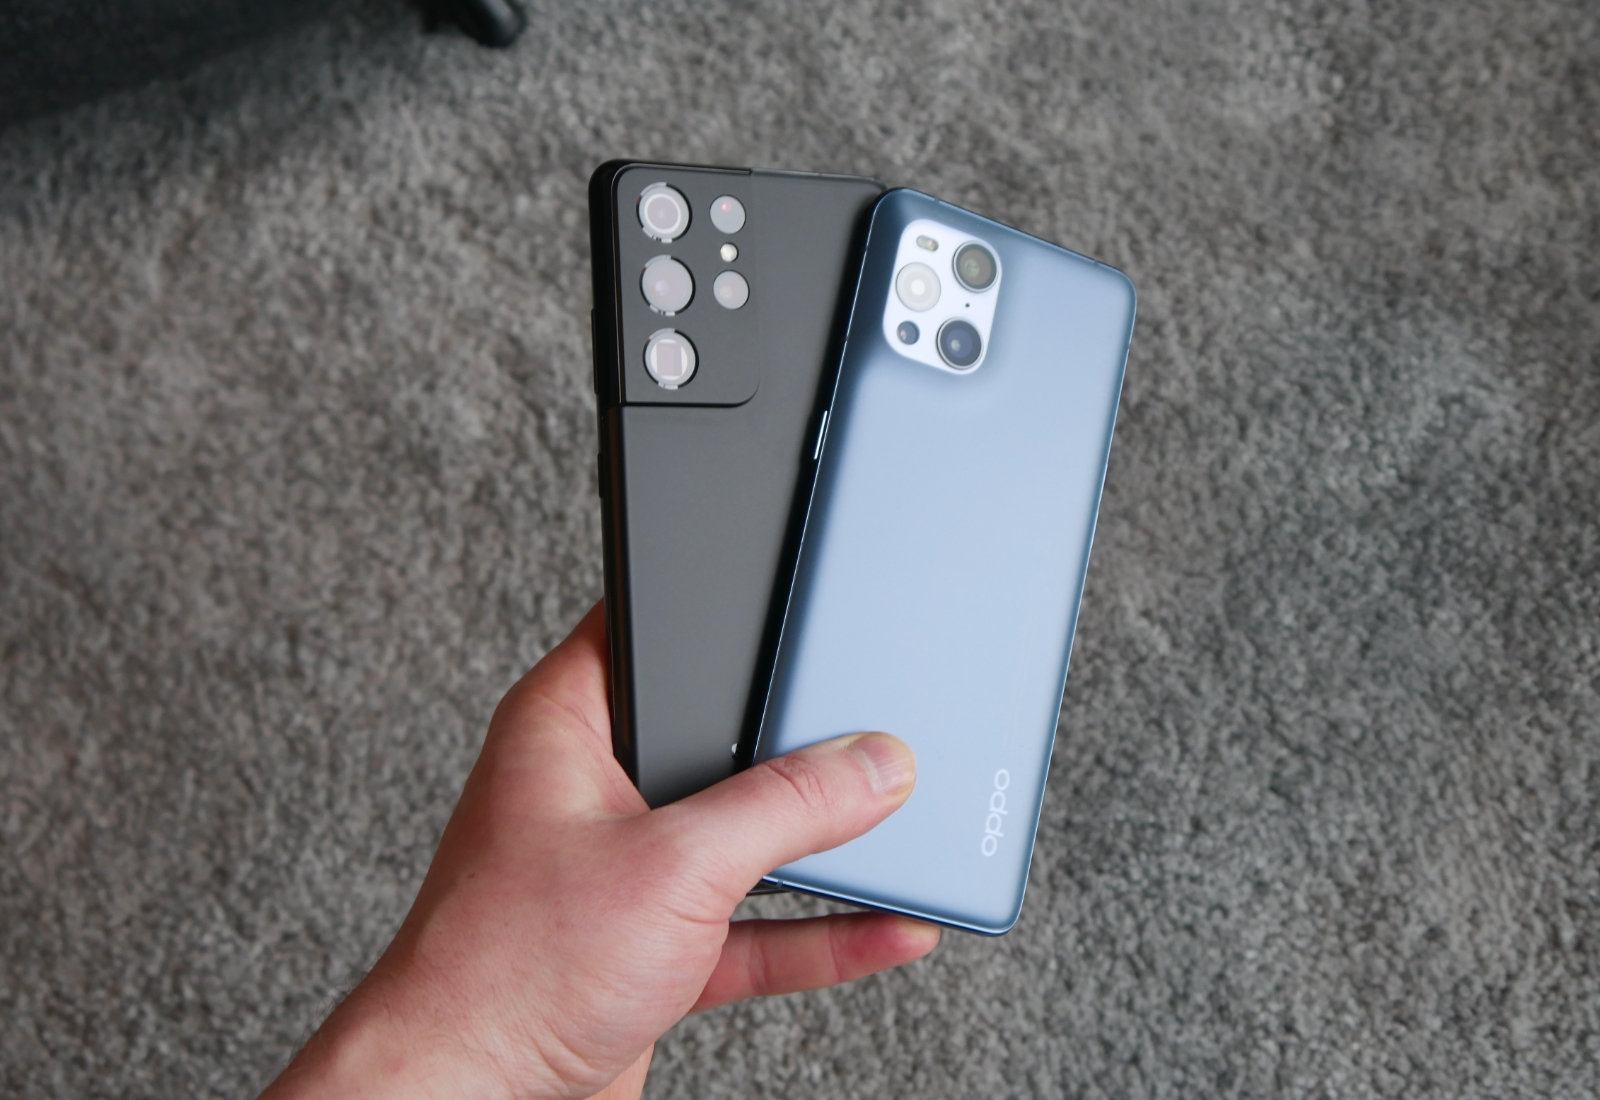 Samsung Galaxy S21 Ultra Oppo Find X3 Pro Hand